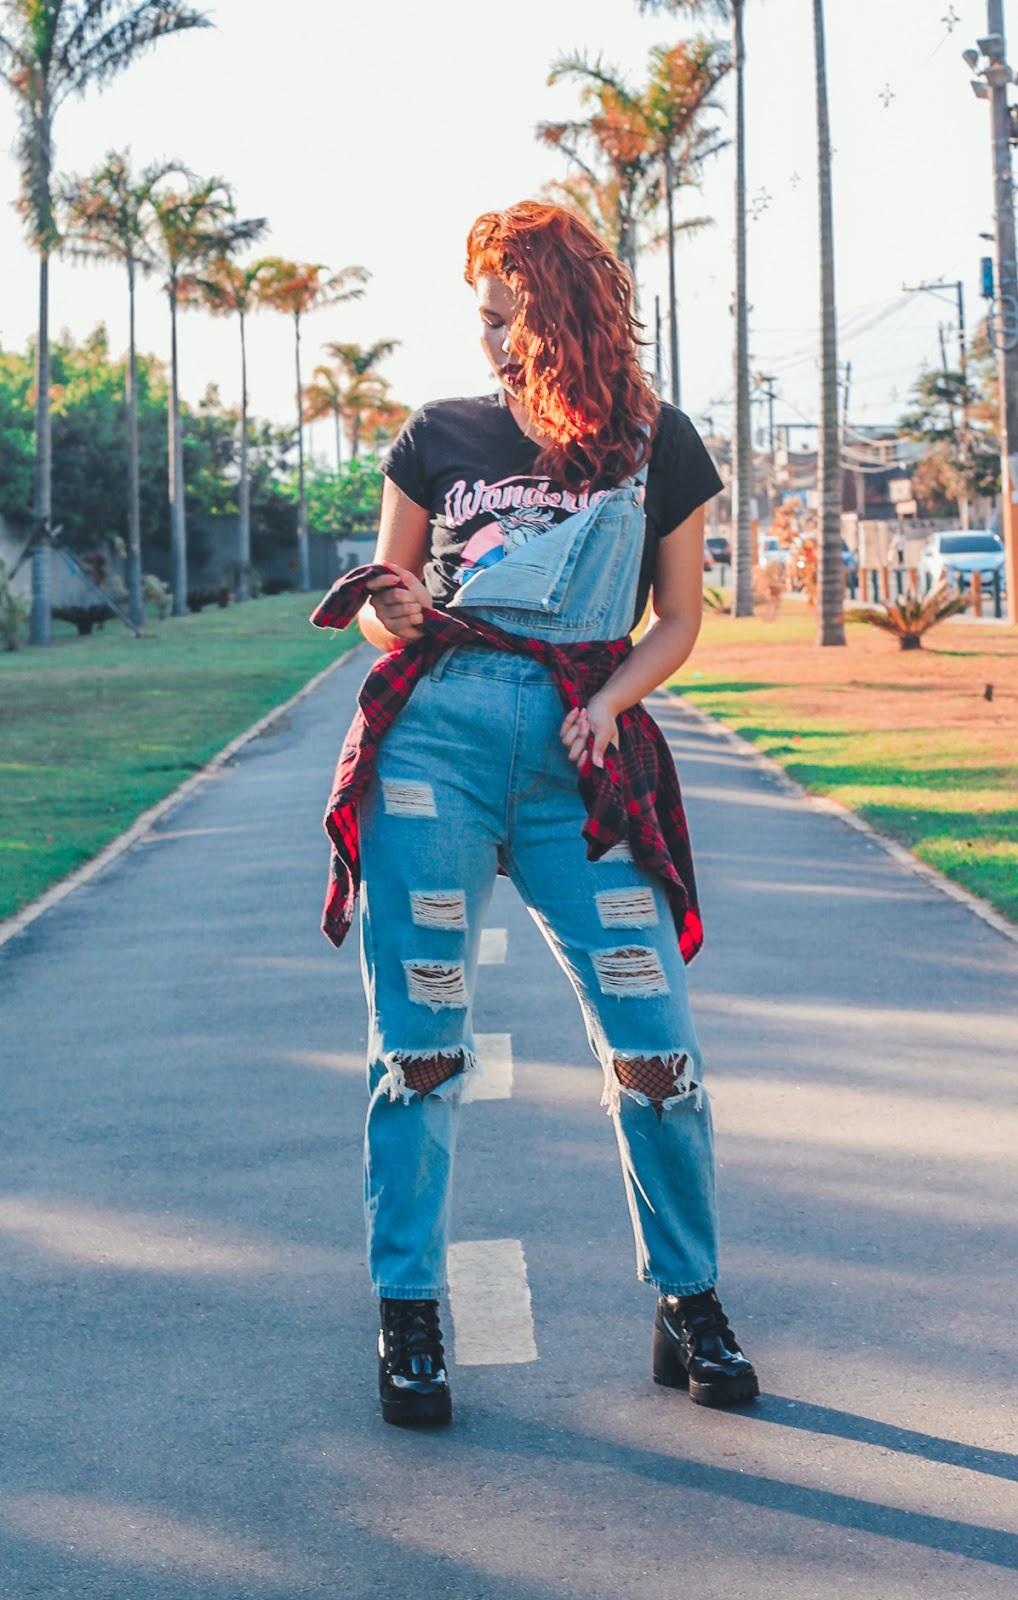 look rocker, look jardineira jeans, look coturno preto verniz salto tratorado, look preto e vermelho, look bolsa de diamante da china, T-shirt preta de unicórnio, cabelo ruivo ondulado, cabelo ondulado natural, look cabelo ondulado, ingrid gleize